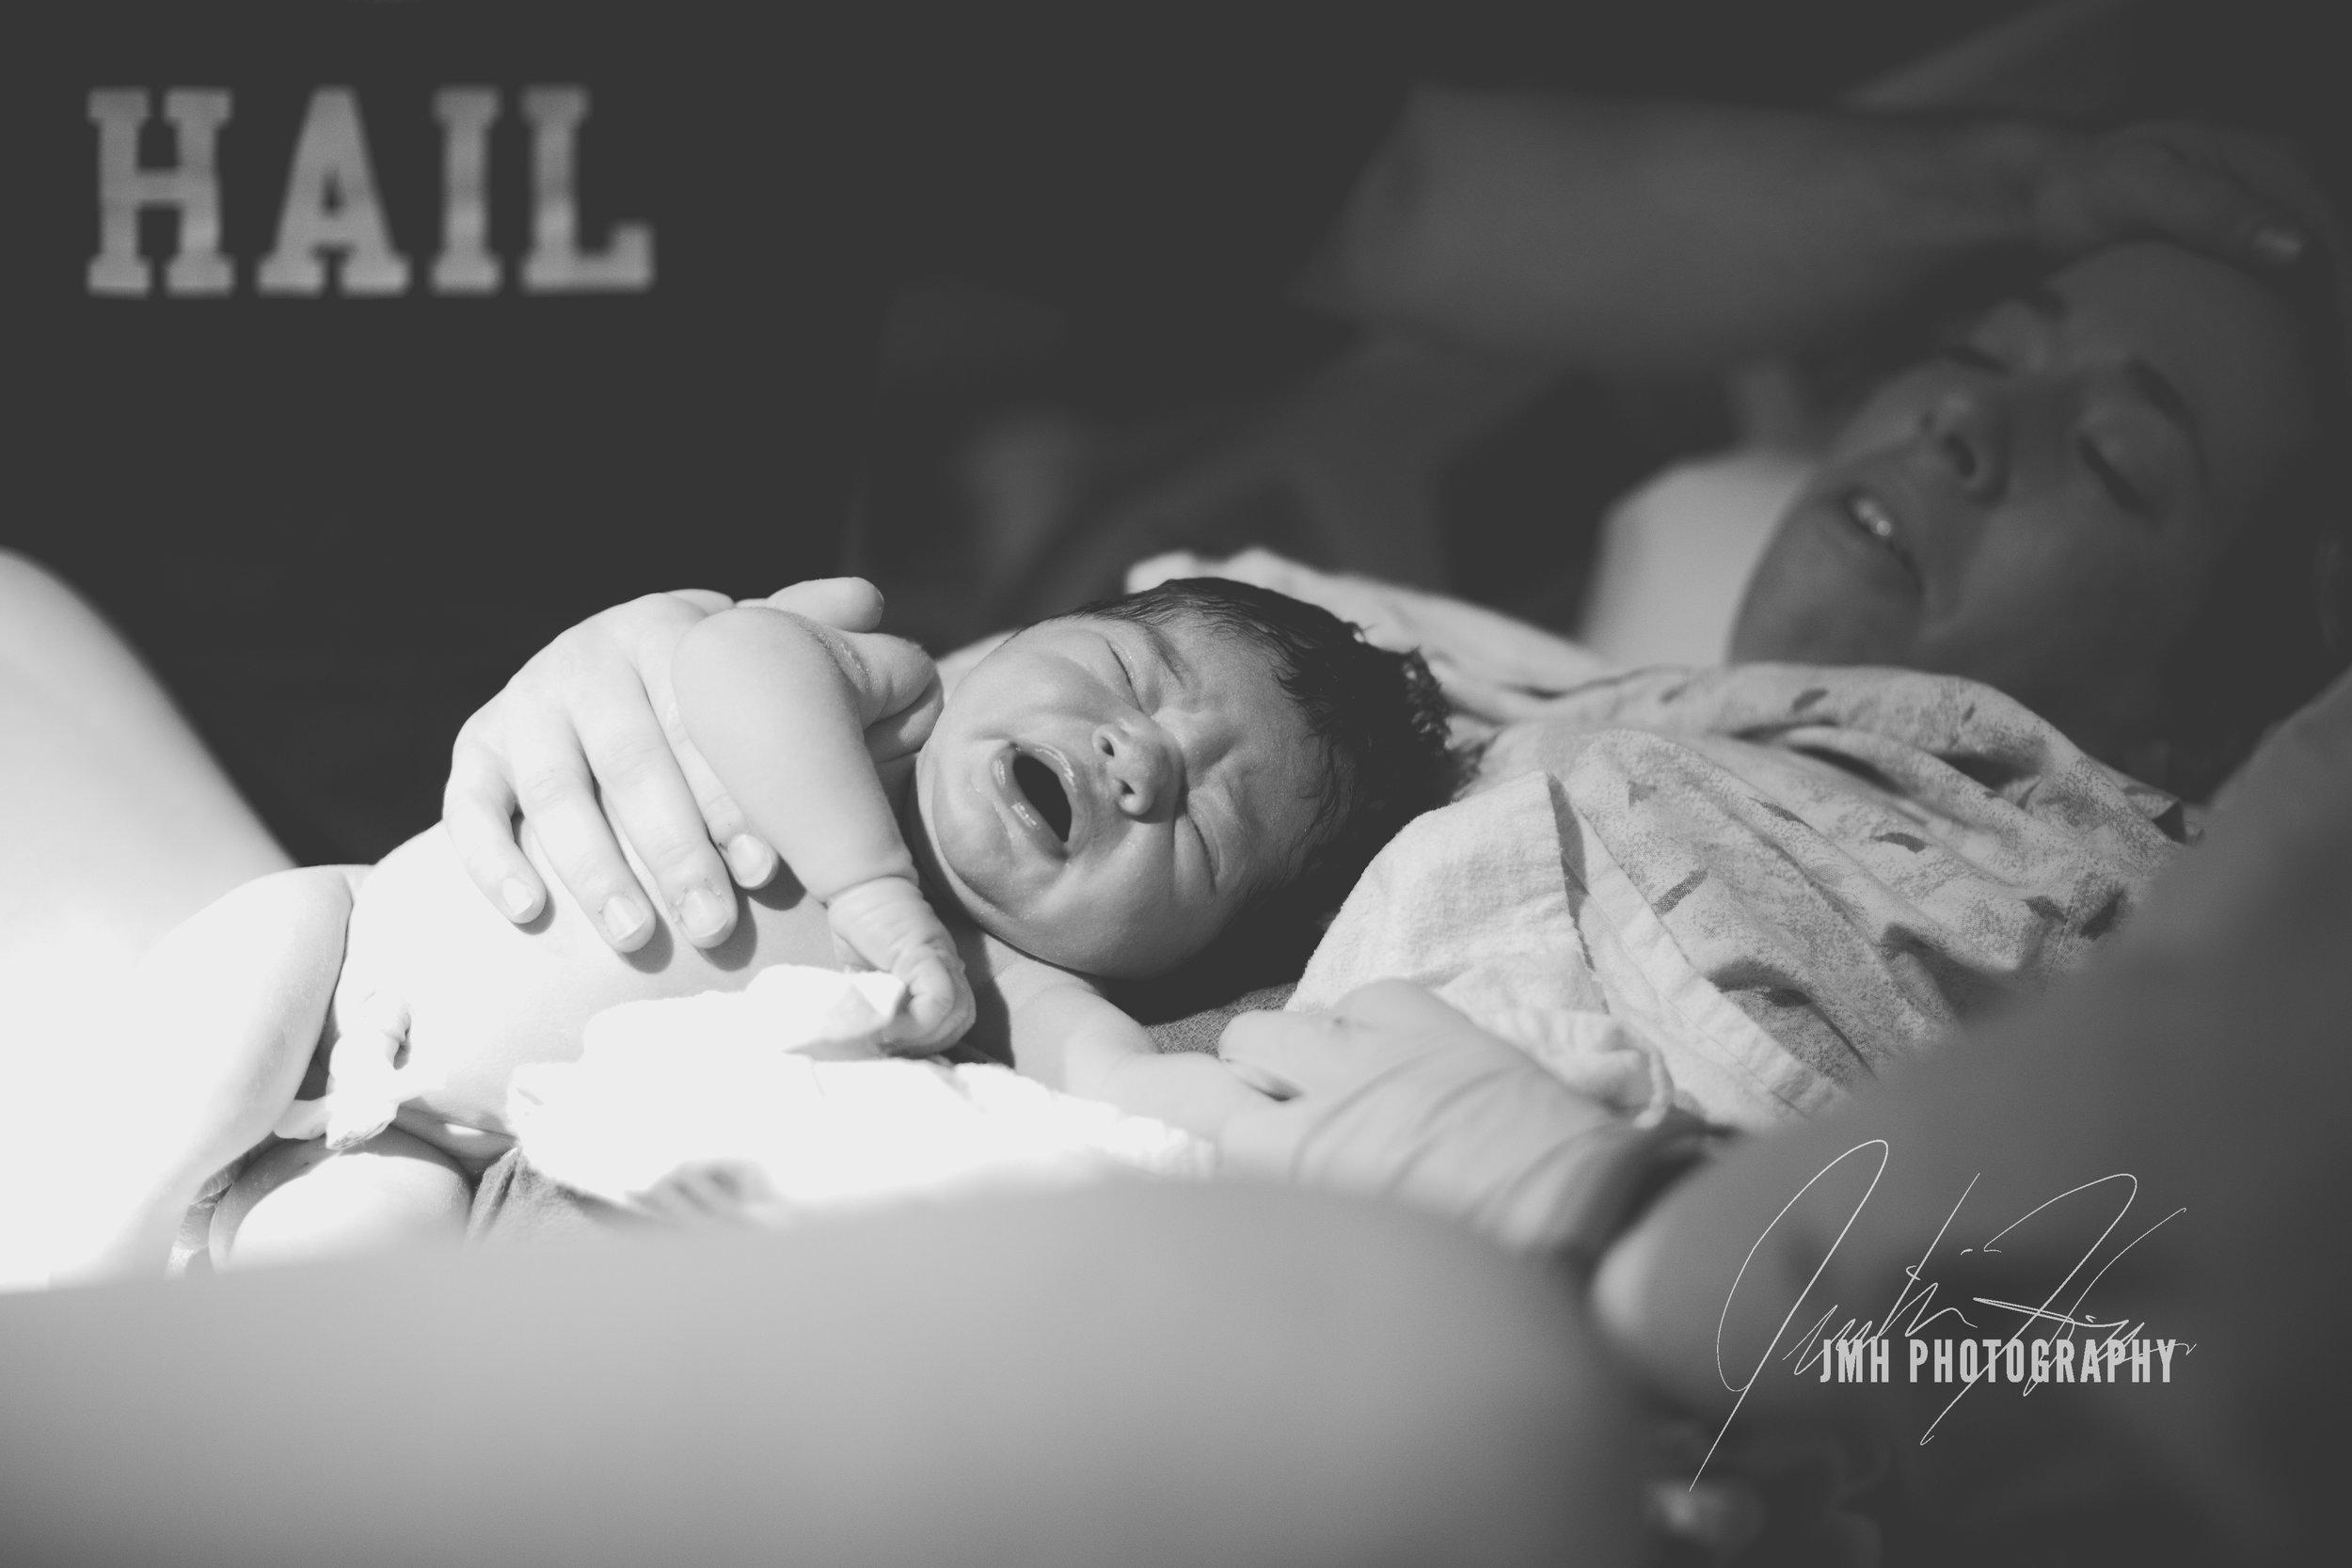 grandrapids_birth_photography-20.jpg